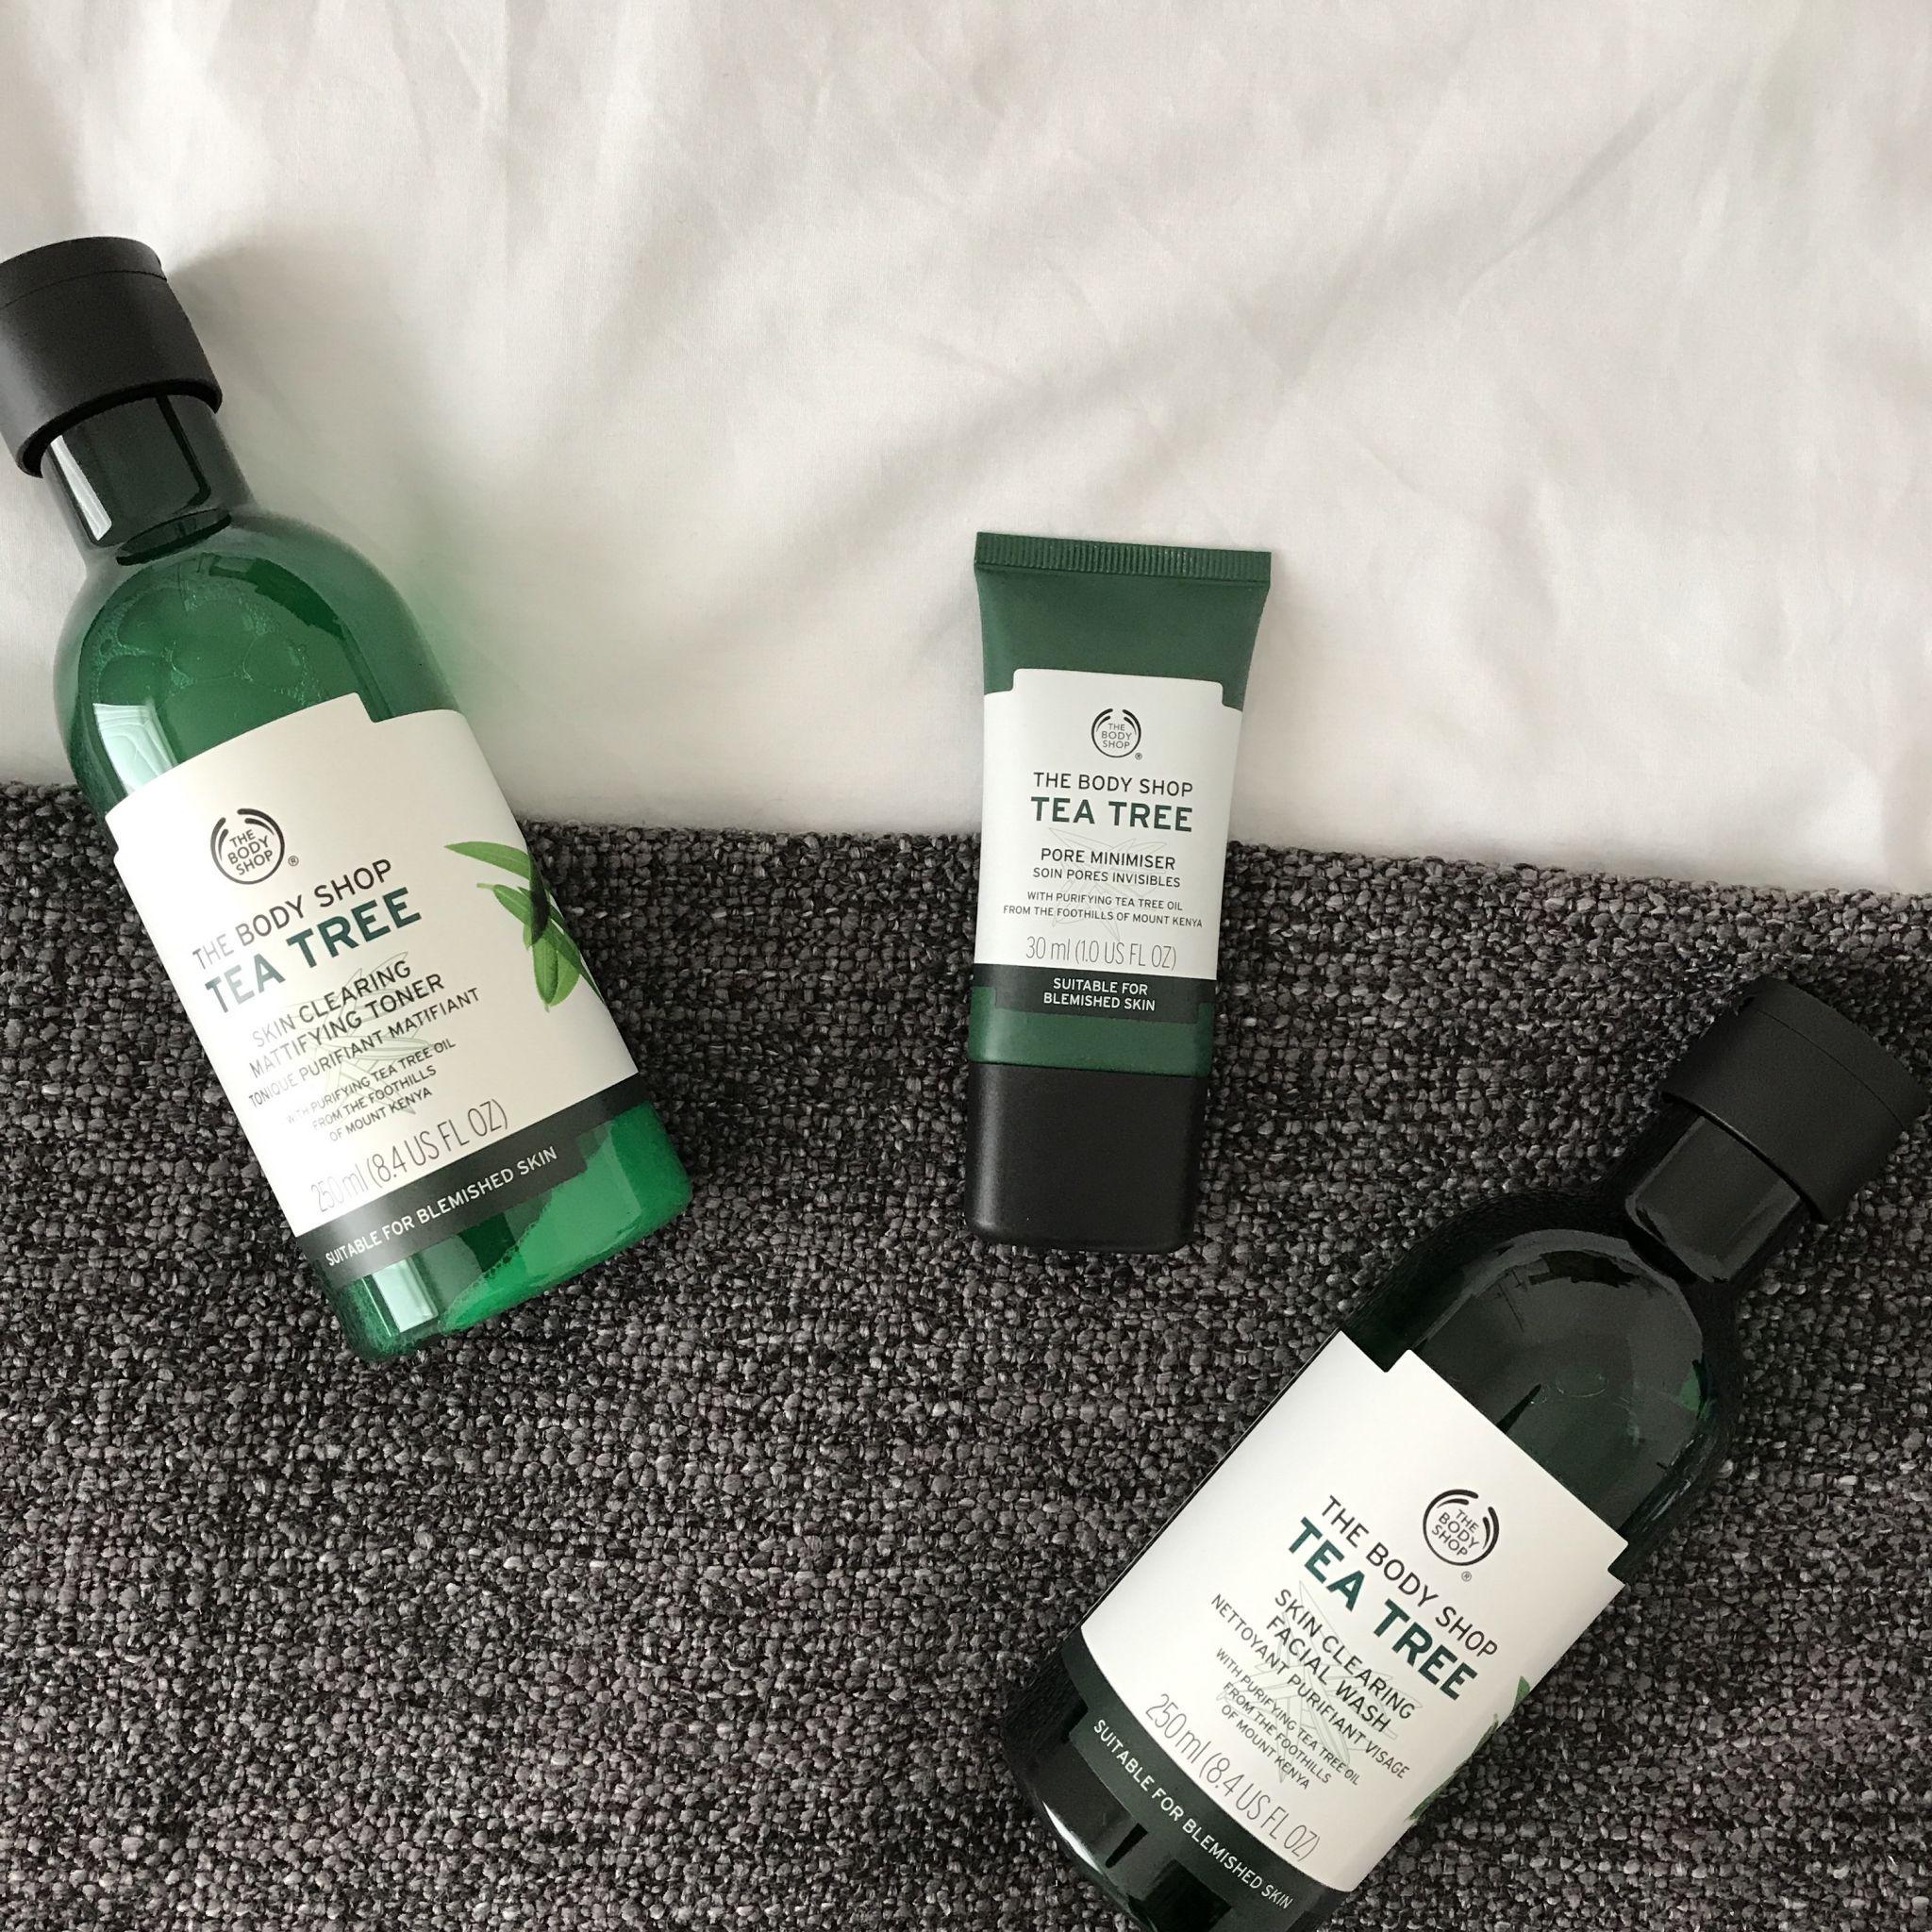 Review The Body Shop Tea Tree Skincare Body shop tea